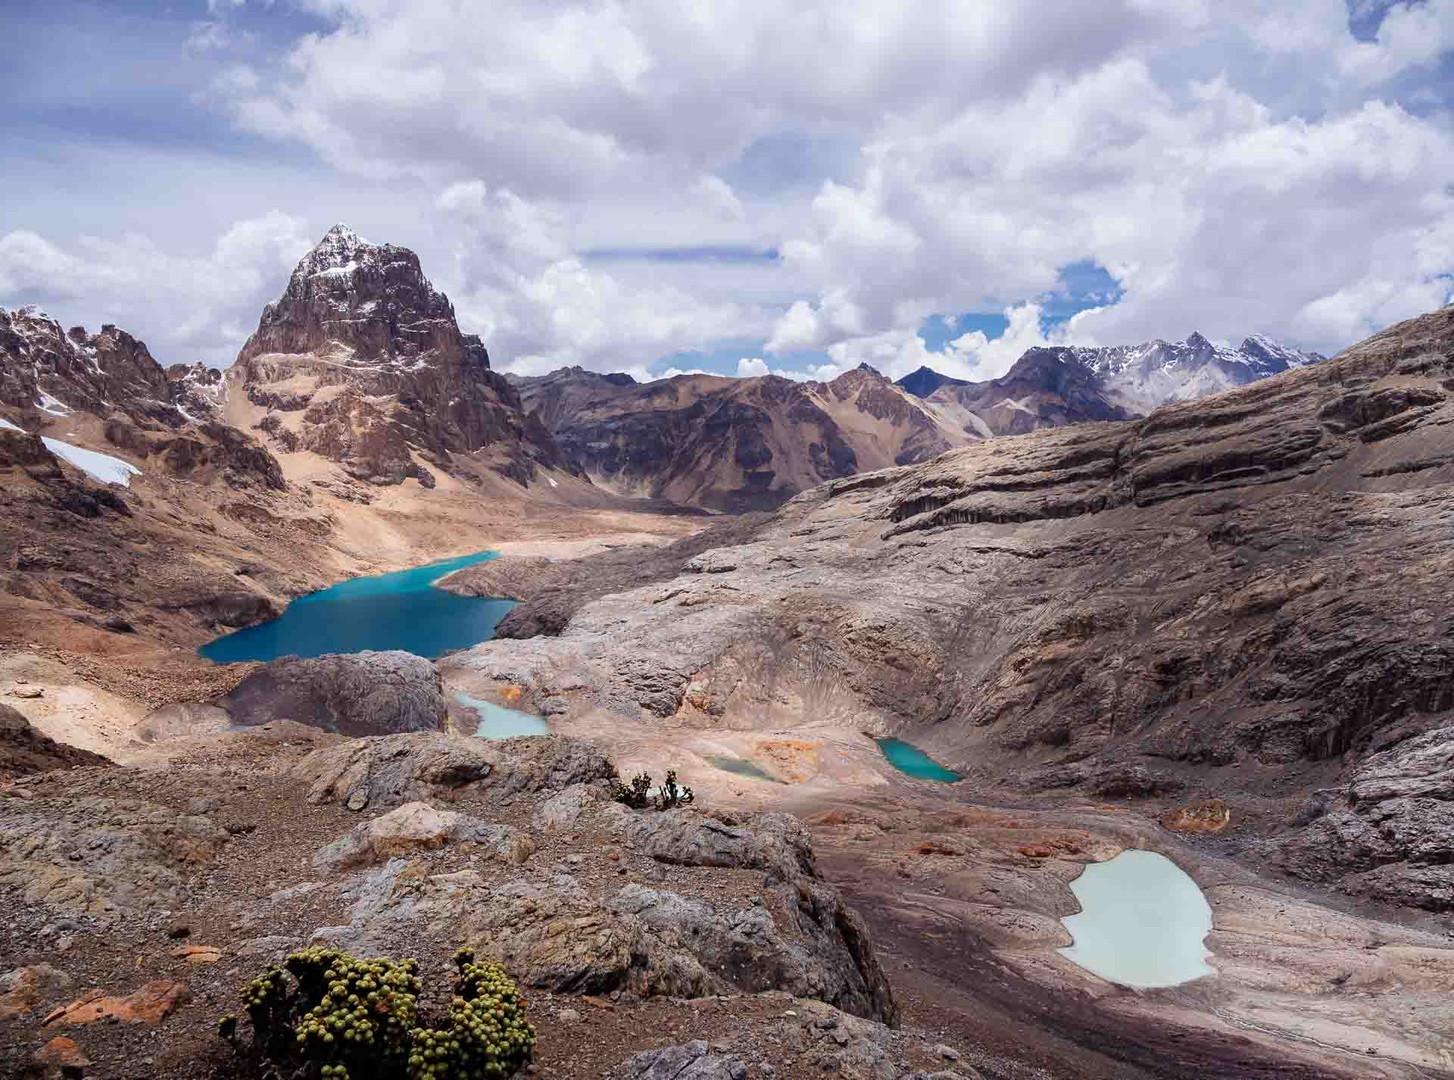 Peru_Huayhuash_Phototour_25.jpg